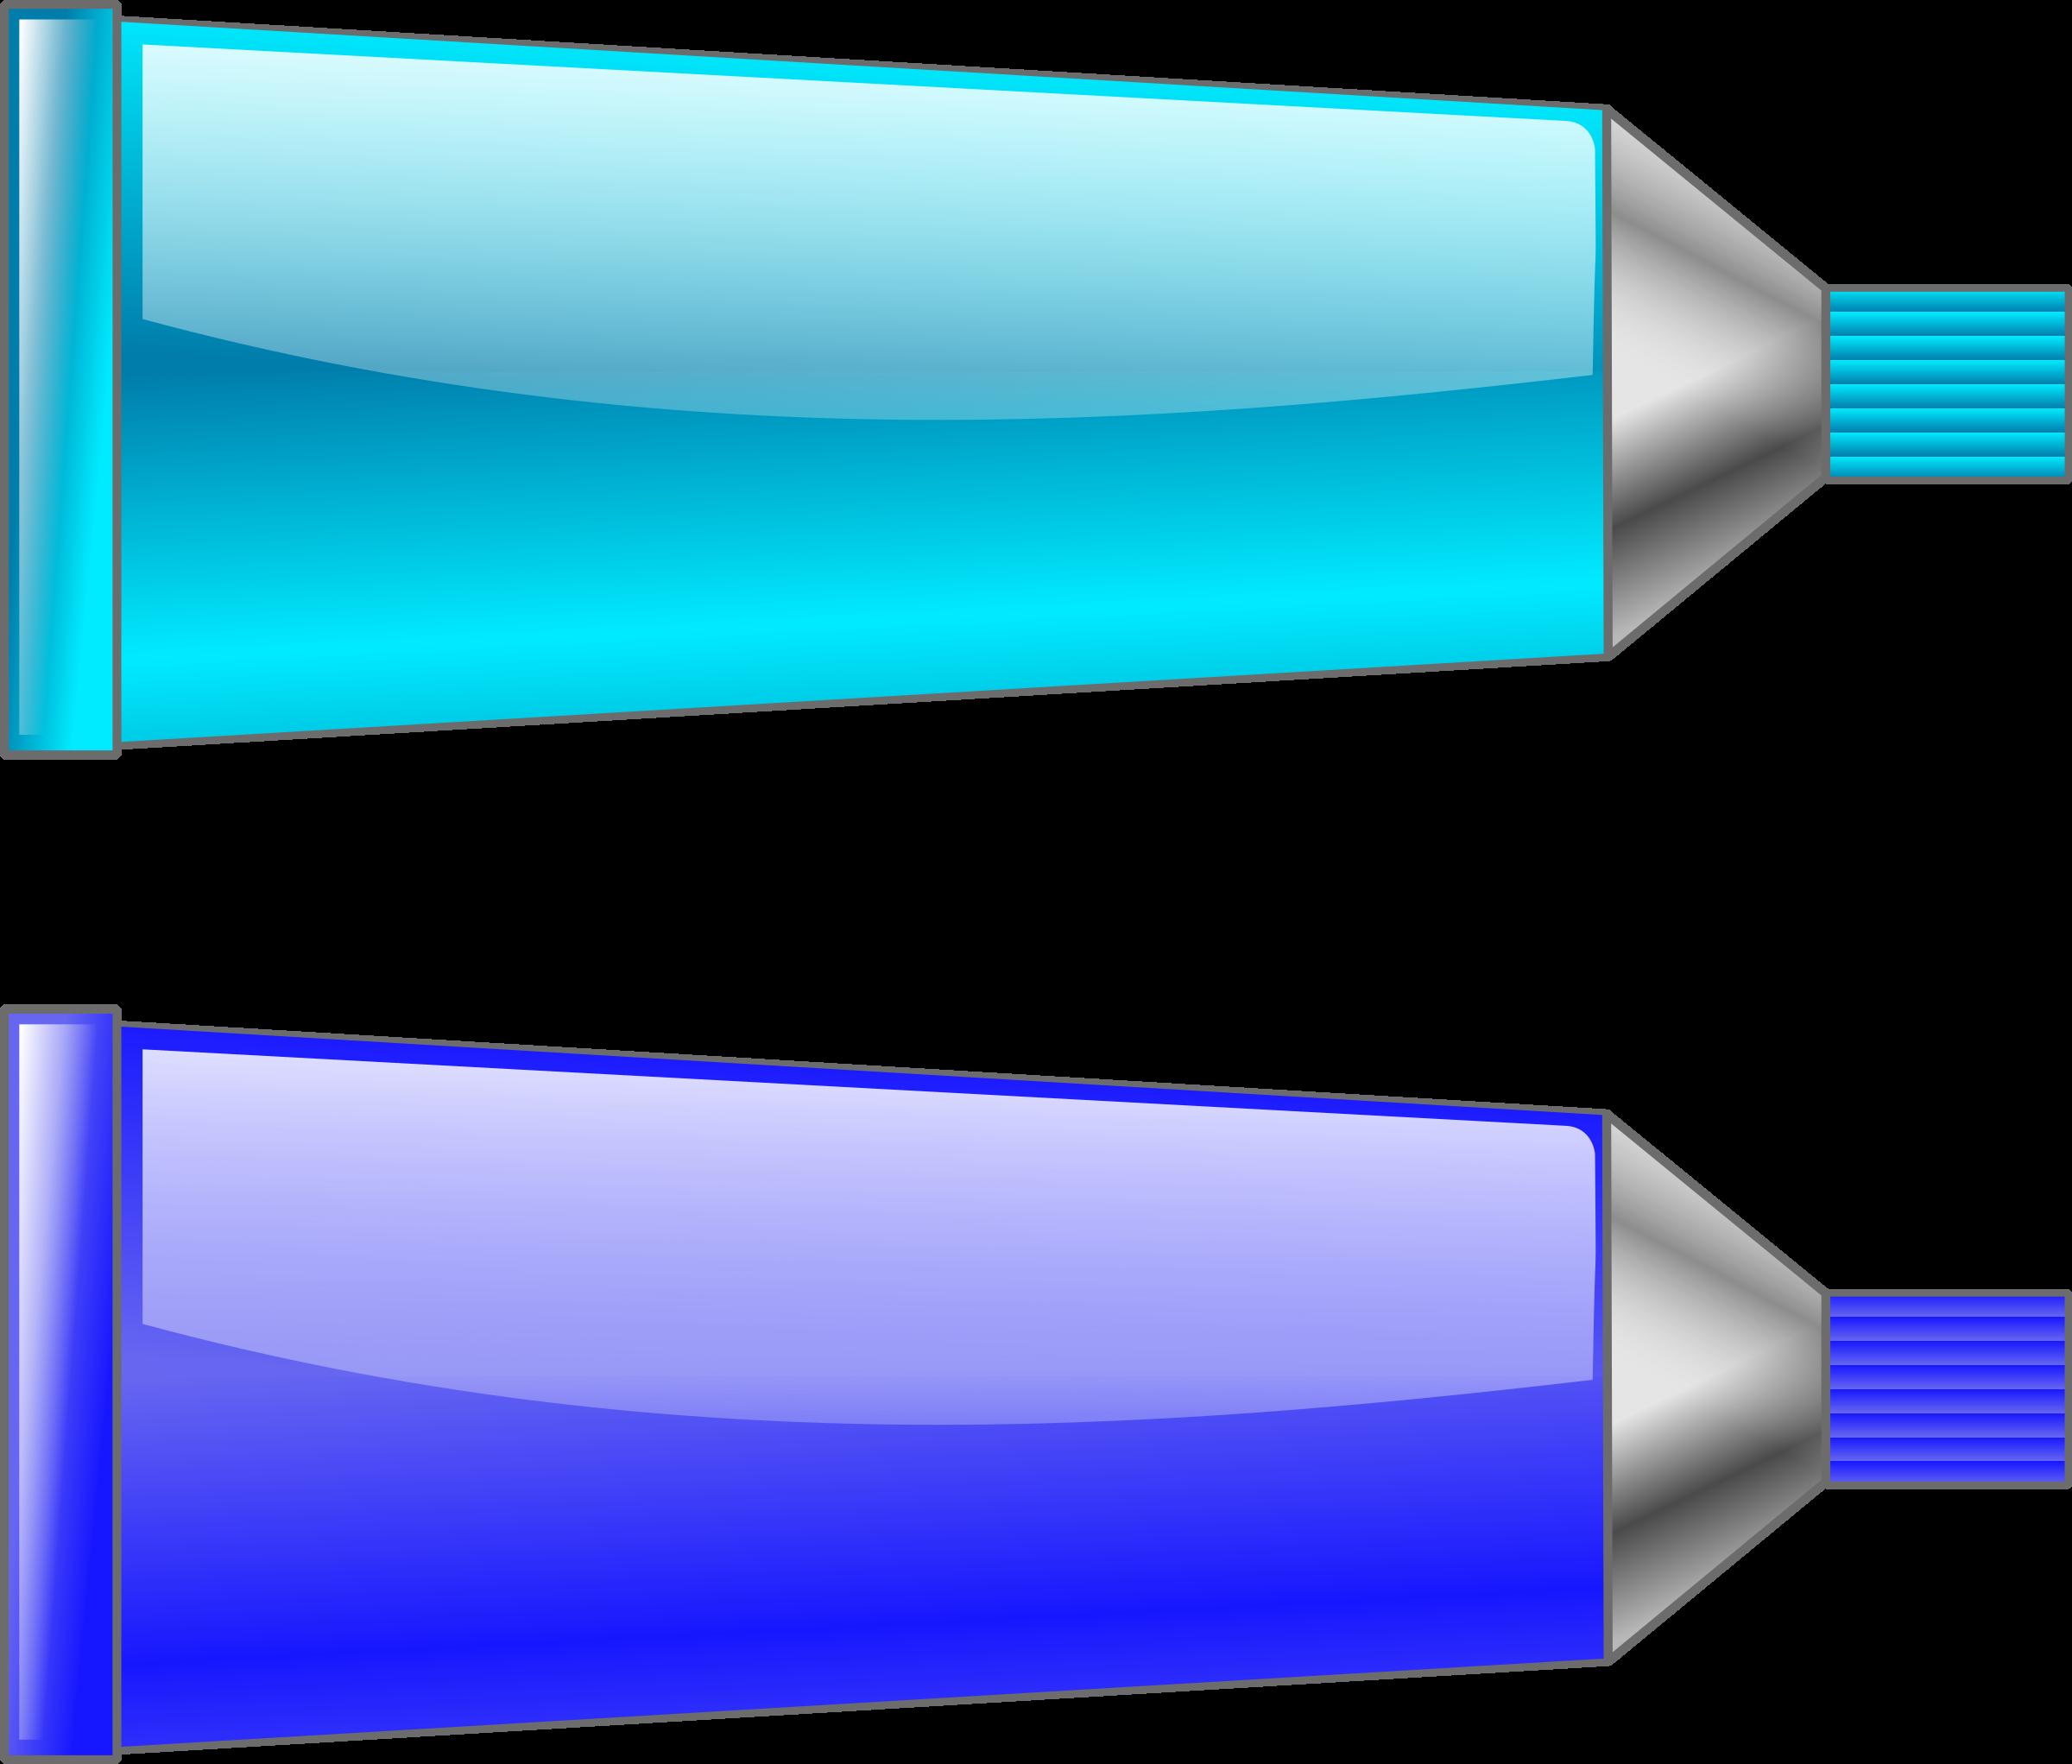 Blue color tube clipart.